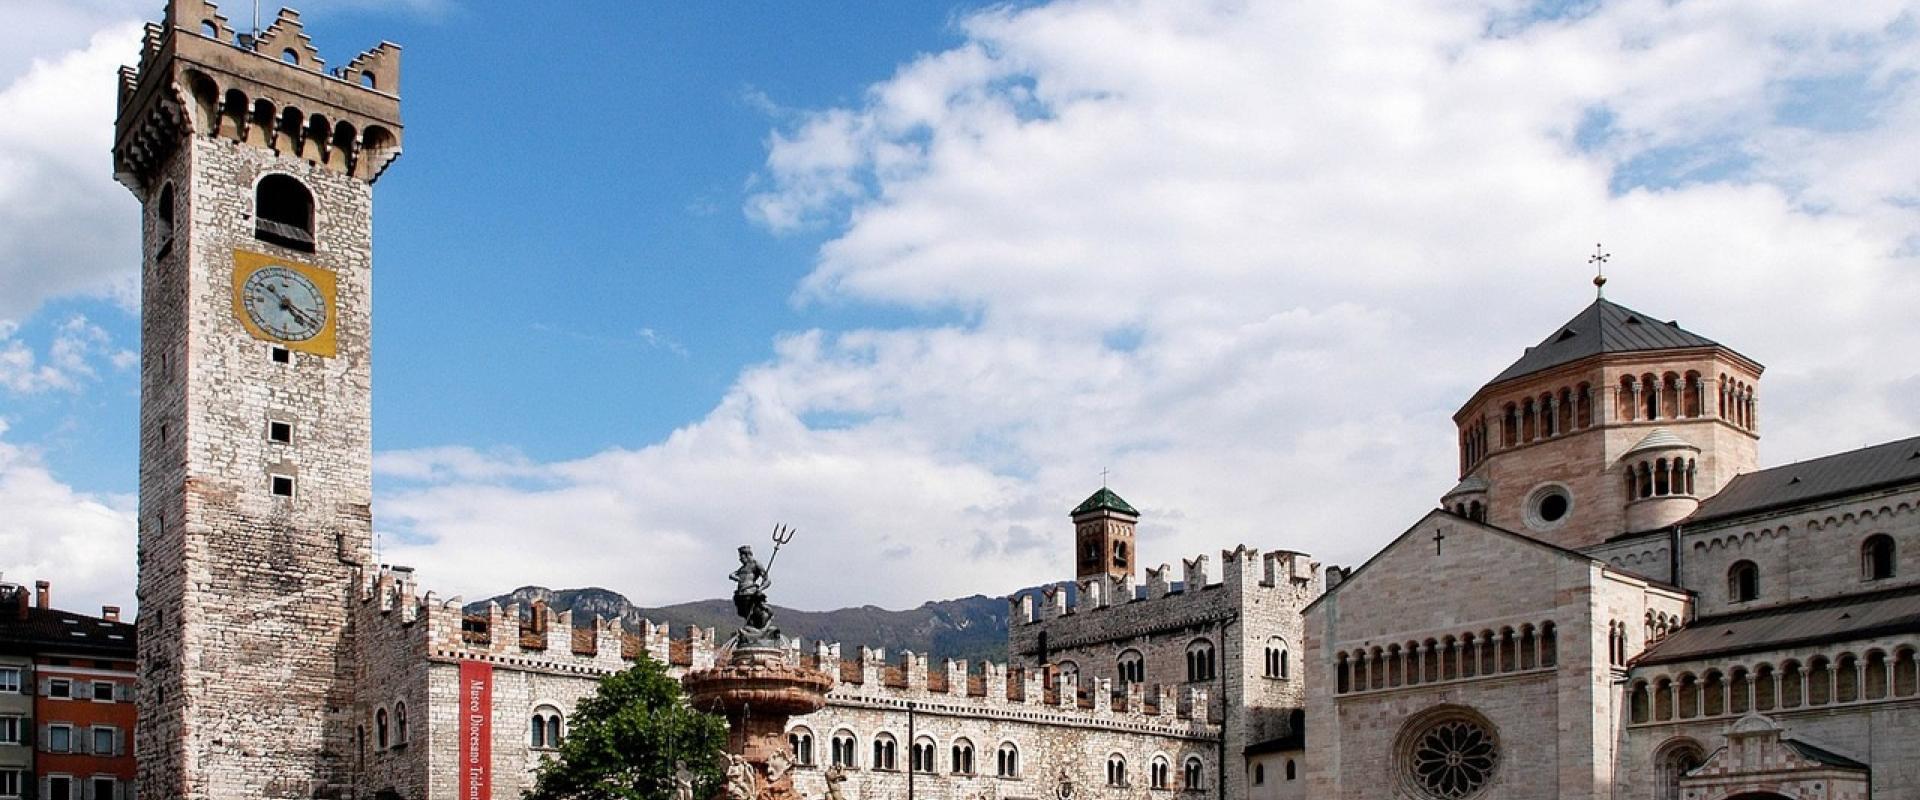 Visit of Trento